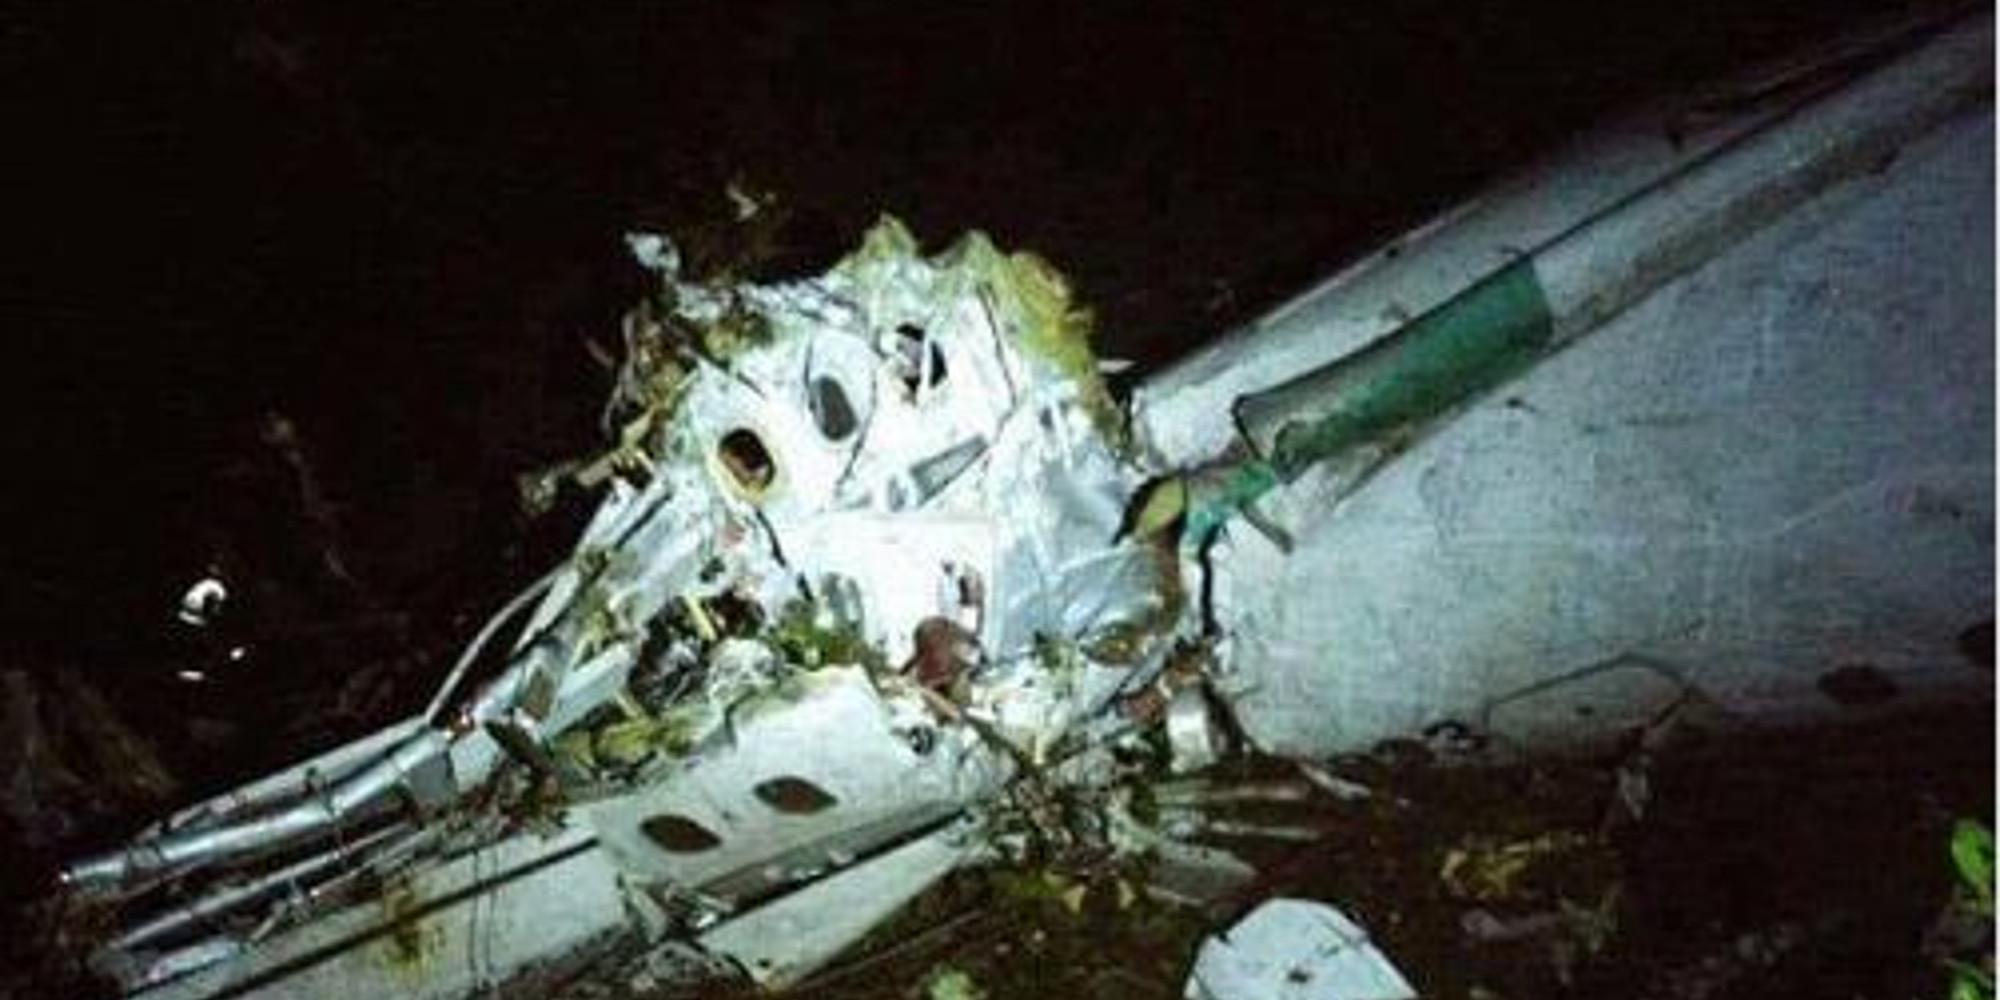 aeroplano-suntrivi-kolomvia-1000 Υπάρχουν επιζώντες από την συντριβή του αεροσκάφους στην Κολομβία